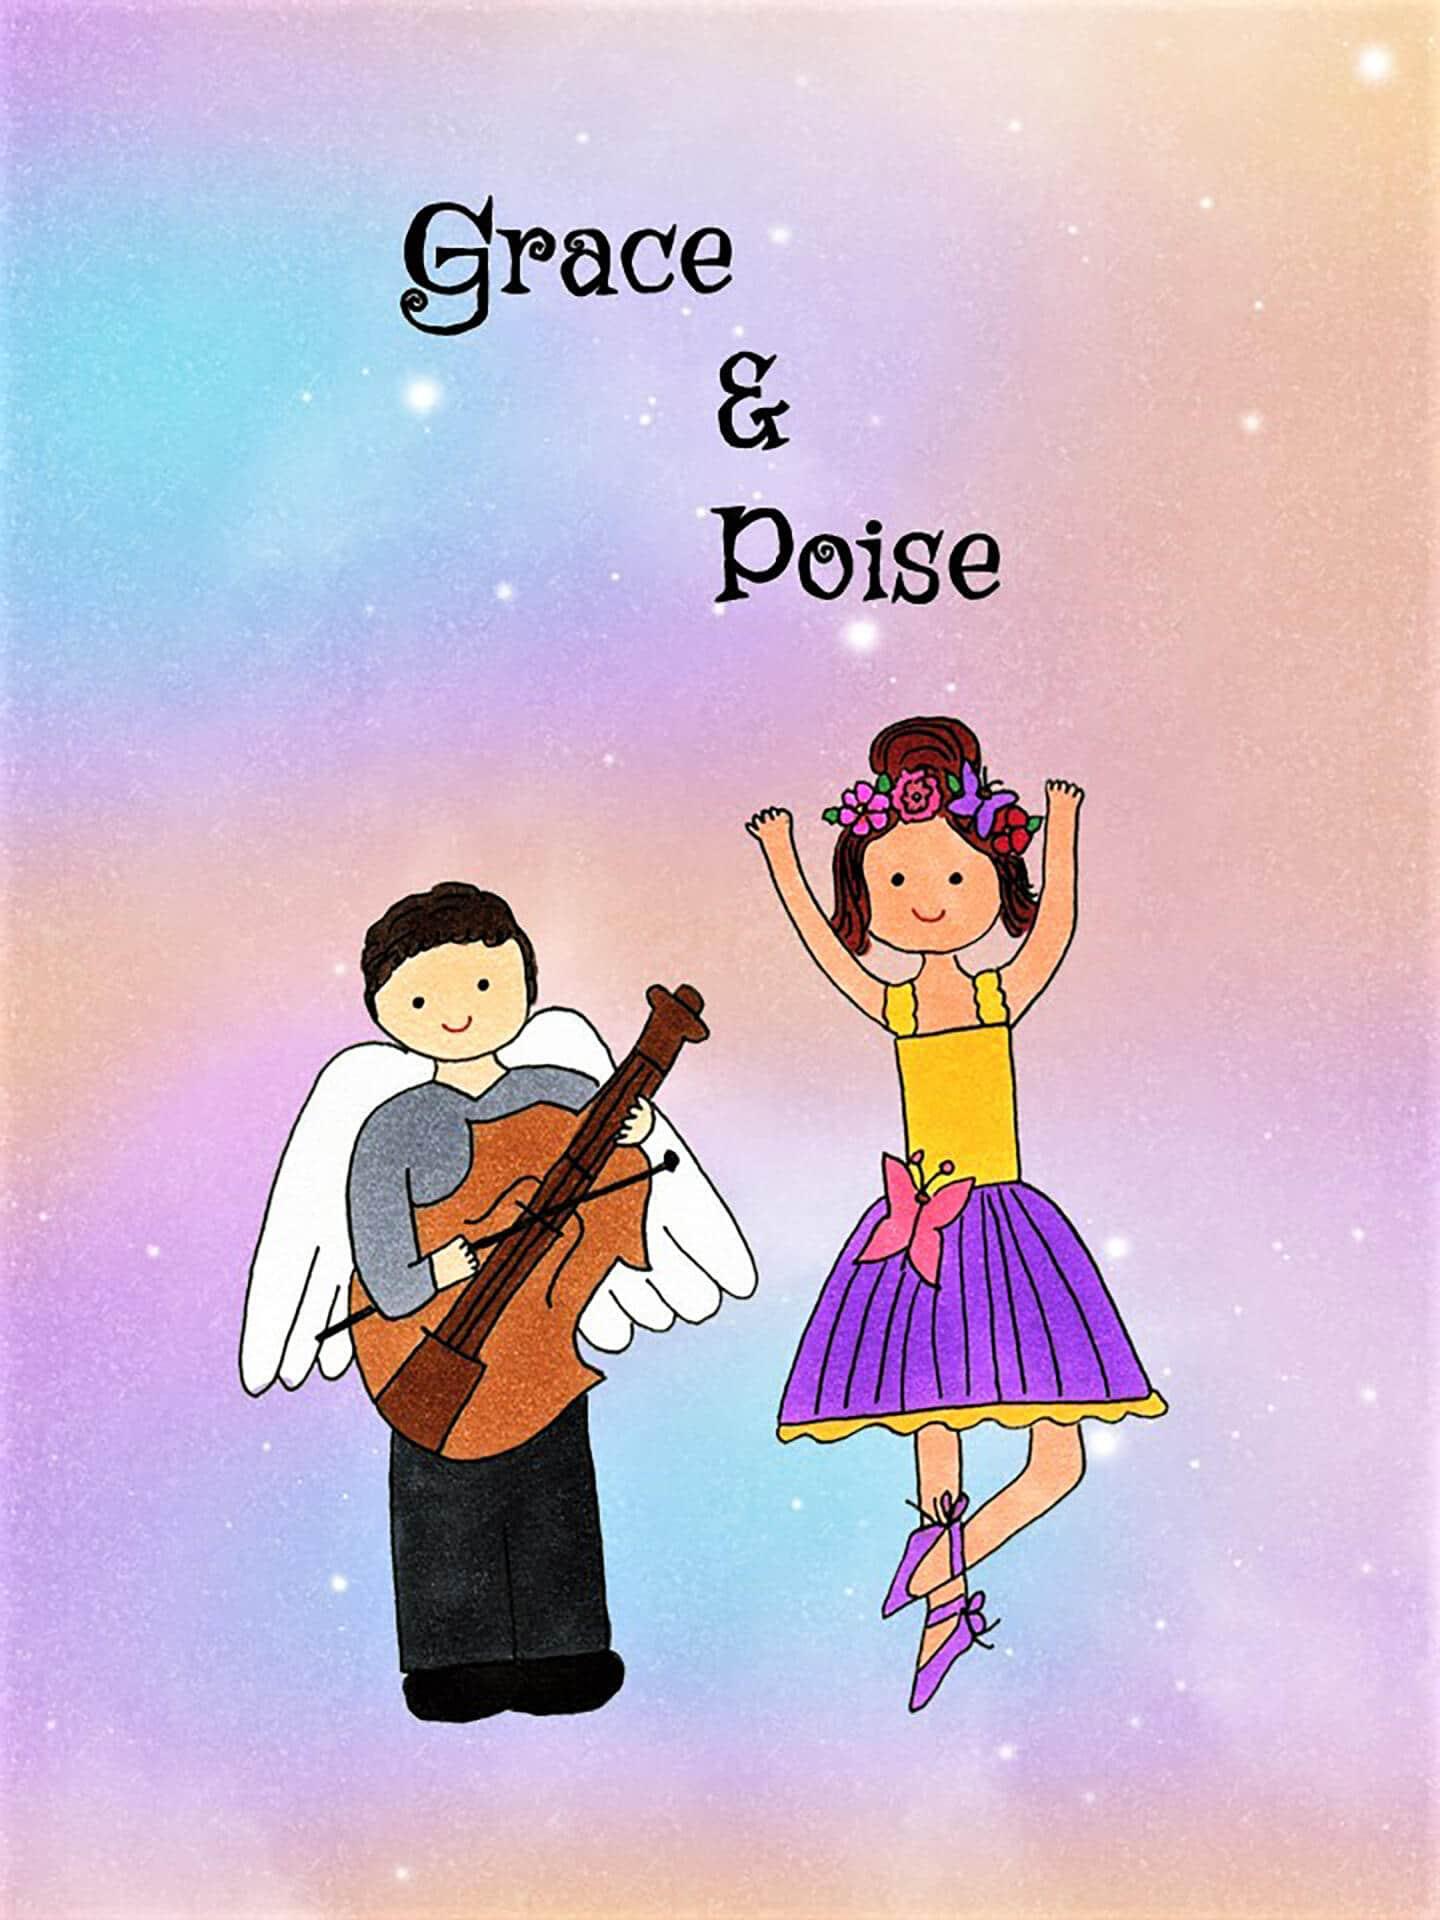 Grace & Poise eCard